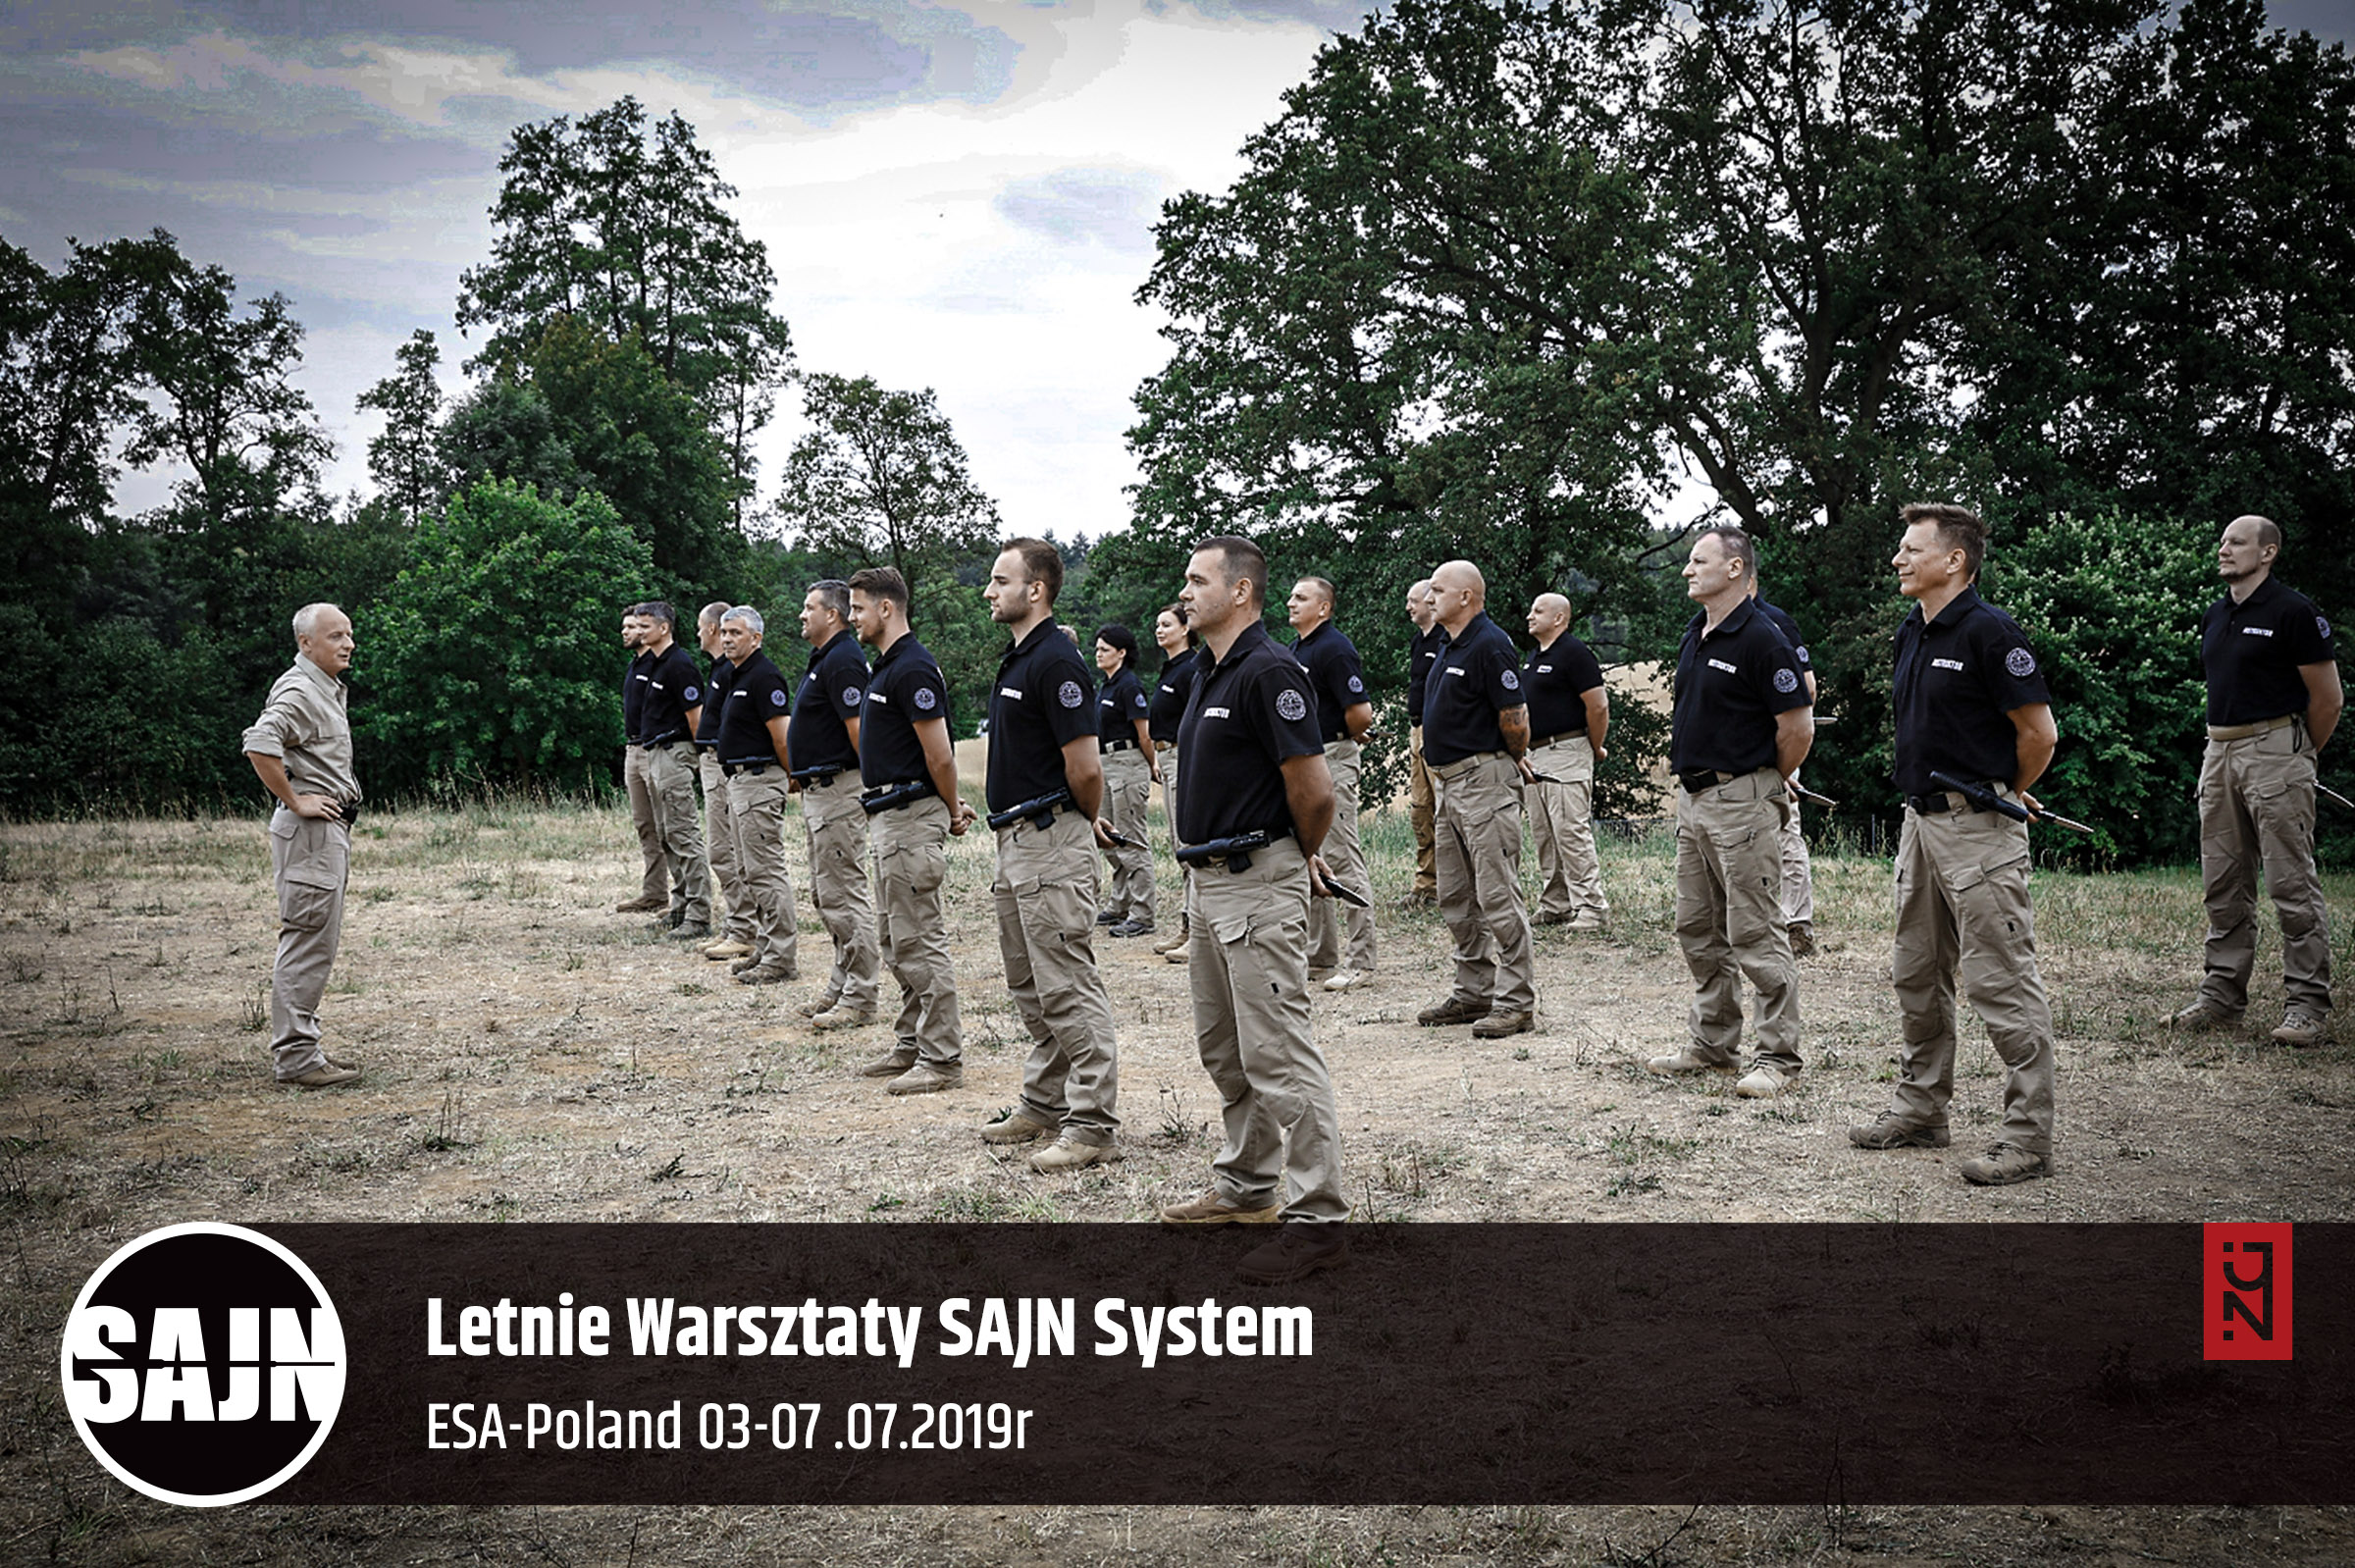 jan nycek_sajn_szkolenie sluzb mundurowych_palka teleskopowa_noz_samoobrona_dosan_21.jpg